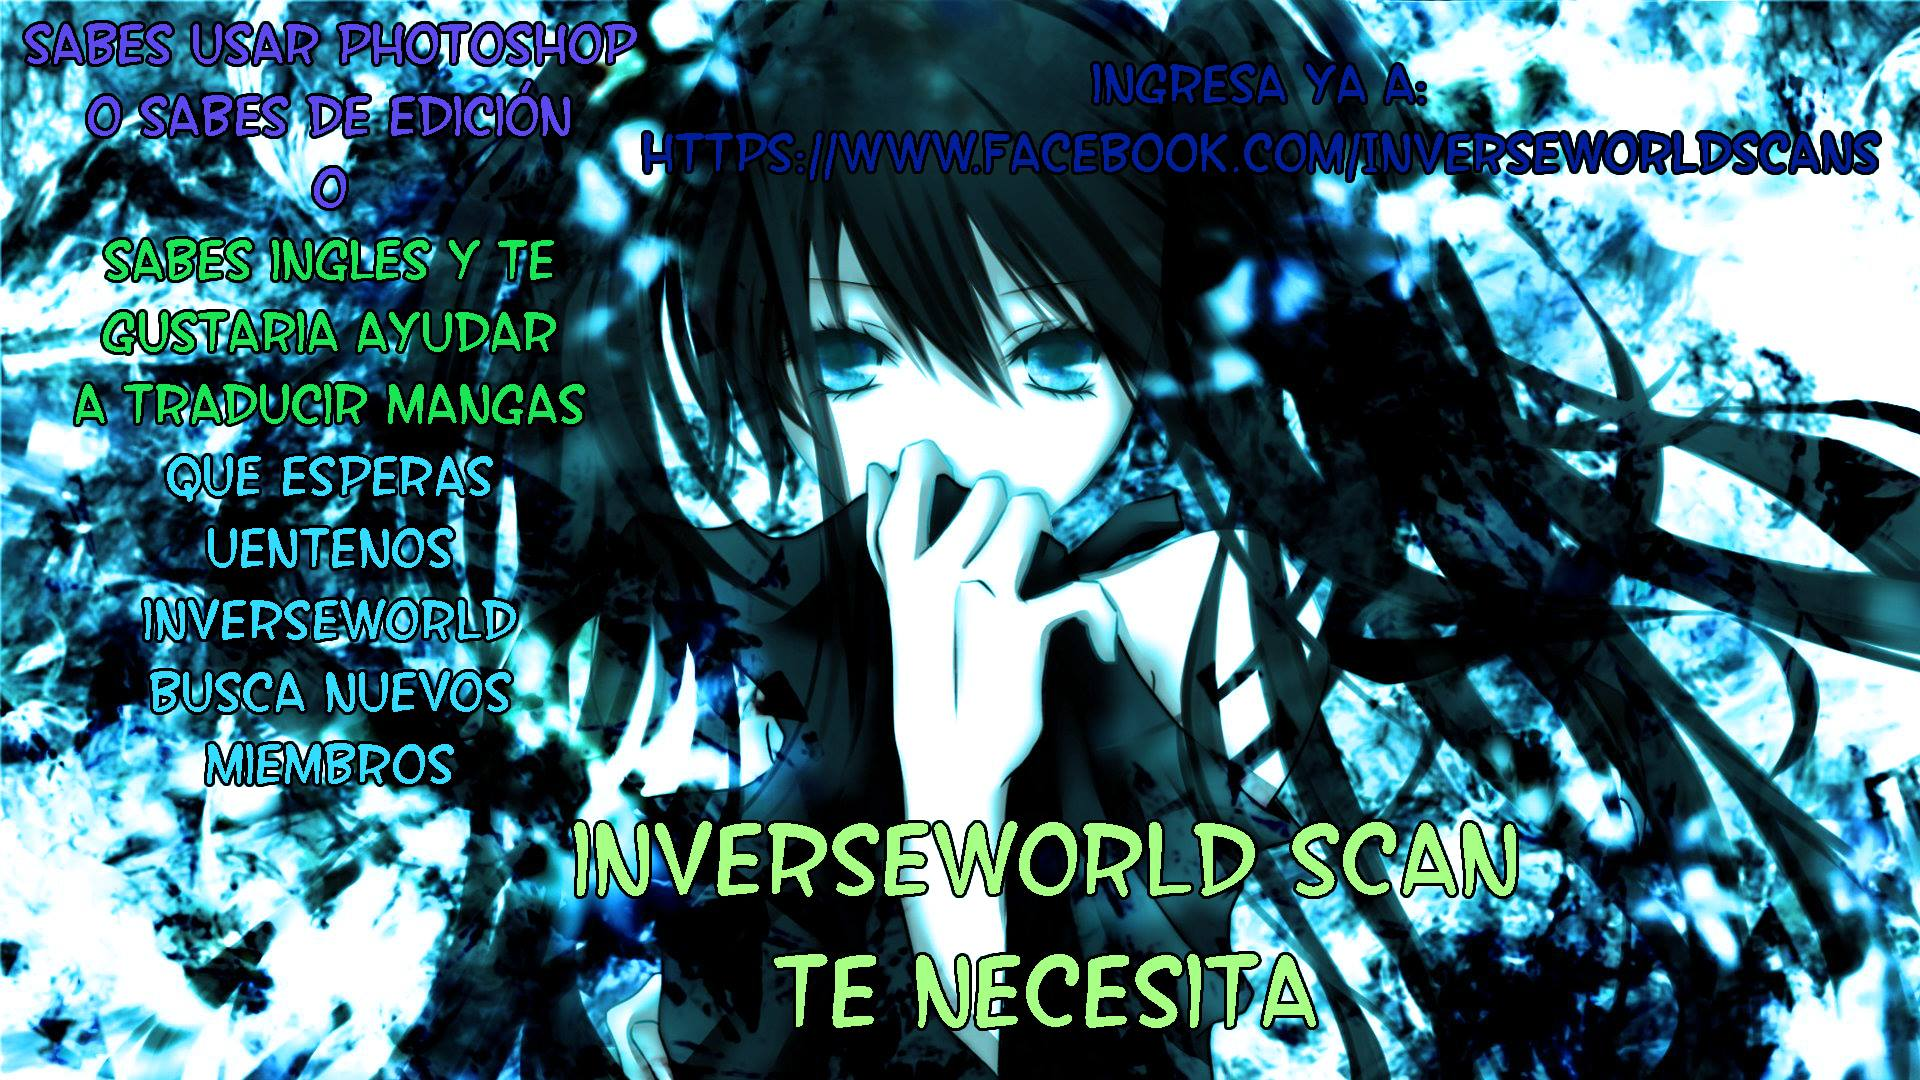 http://c5.ninemanga.com/es_manga/18/16210/415315/bd5af7cd922fd2603be4ee3dc43b0b77.jpg Page 2